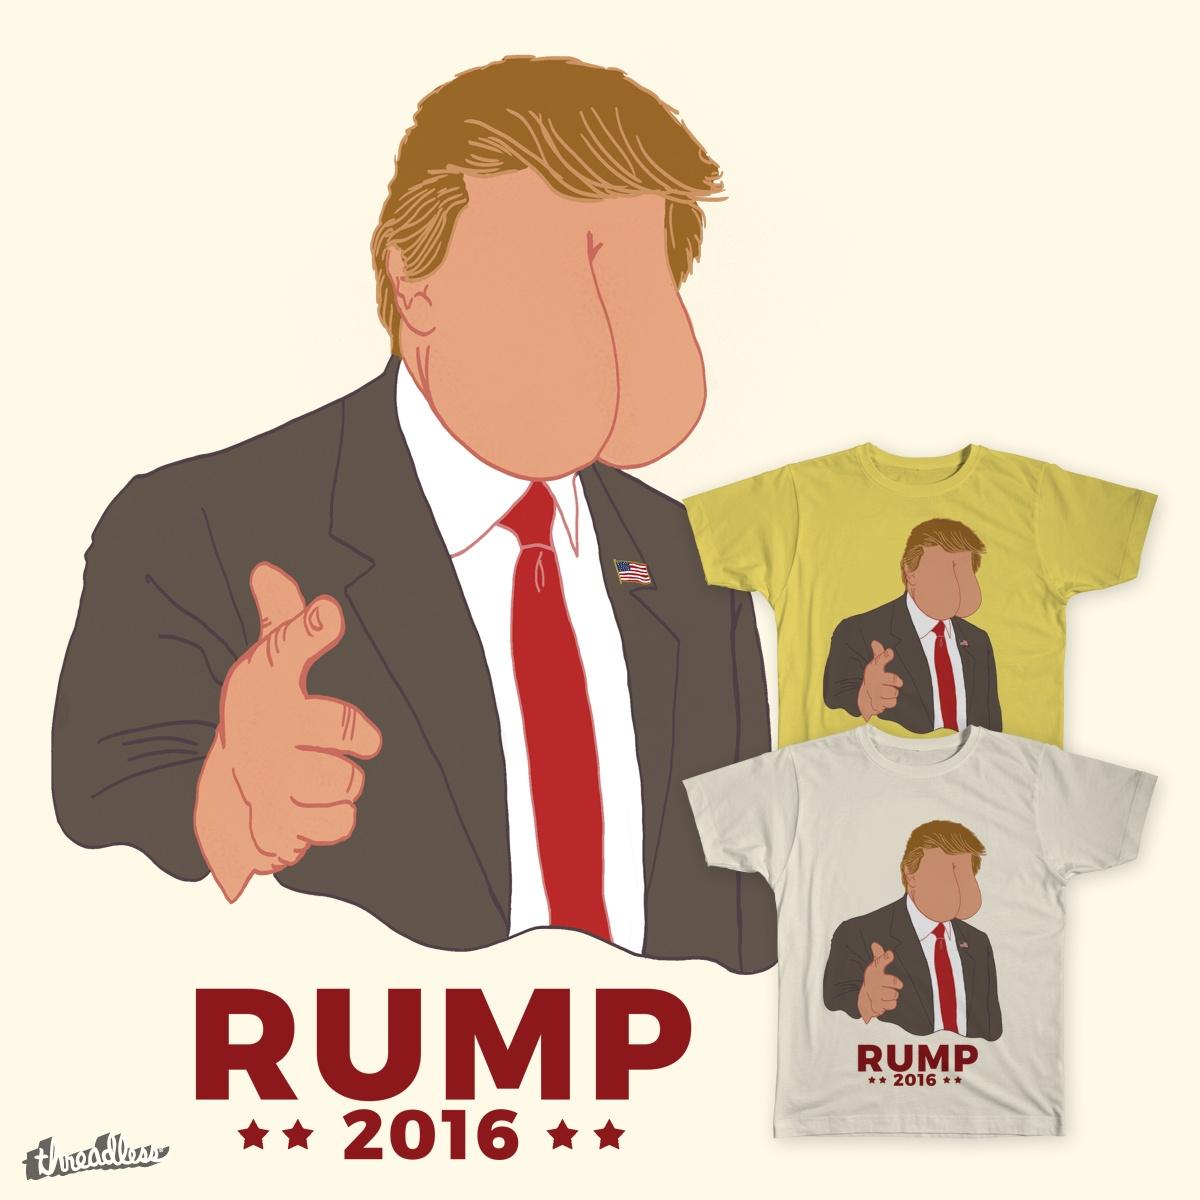 RUMP 2016 by Thefakist on Threadless